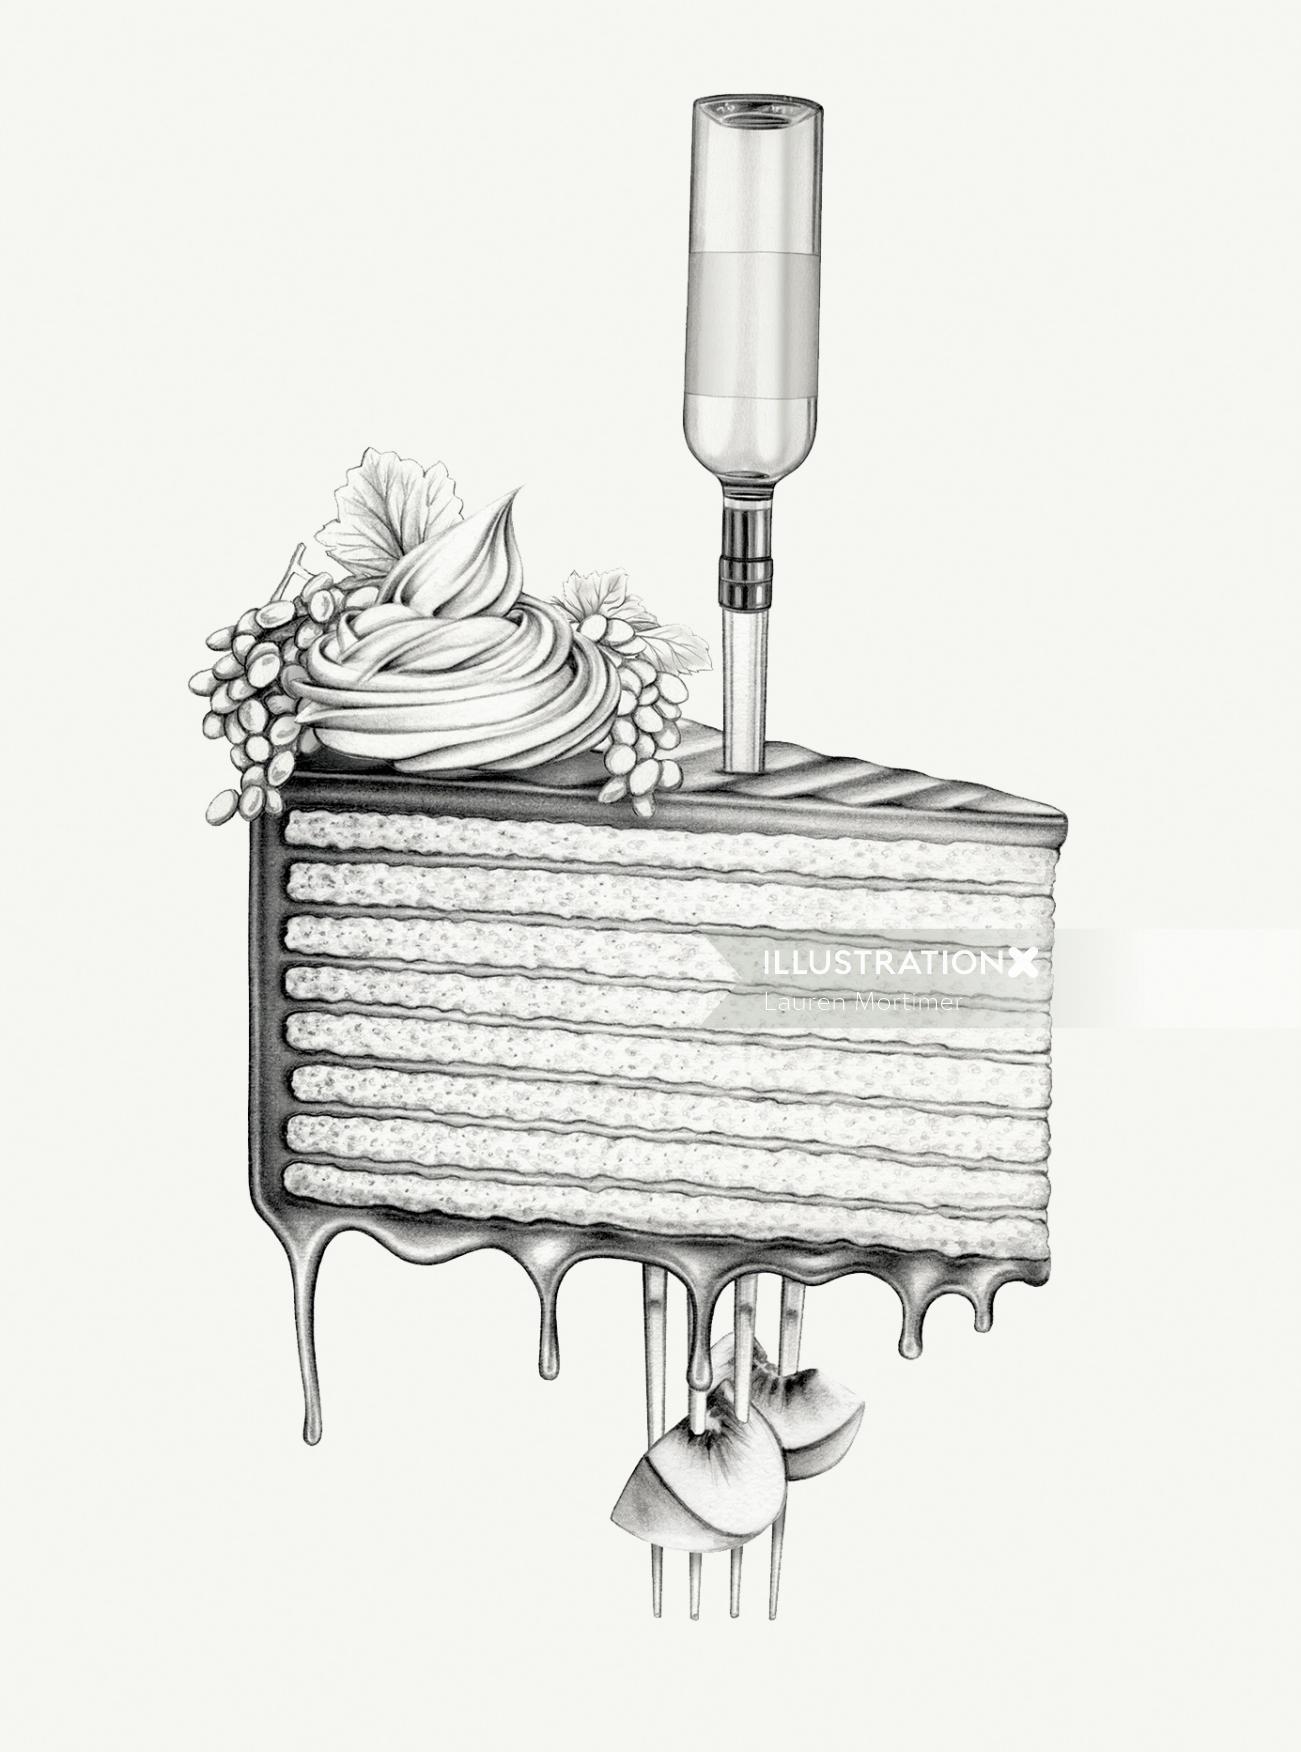 surreal cake drawing